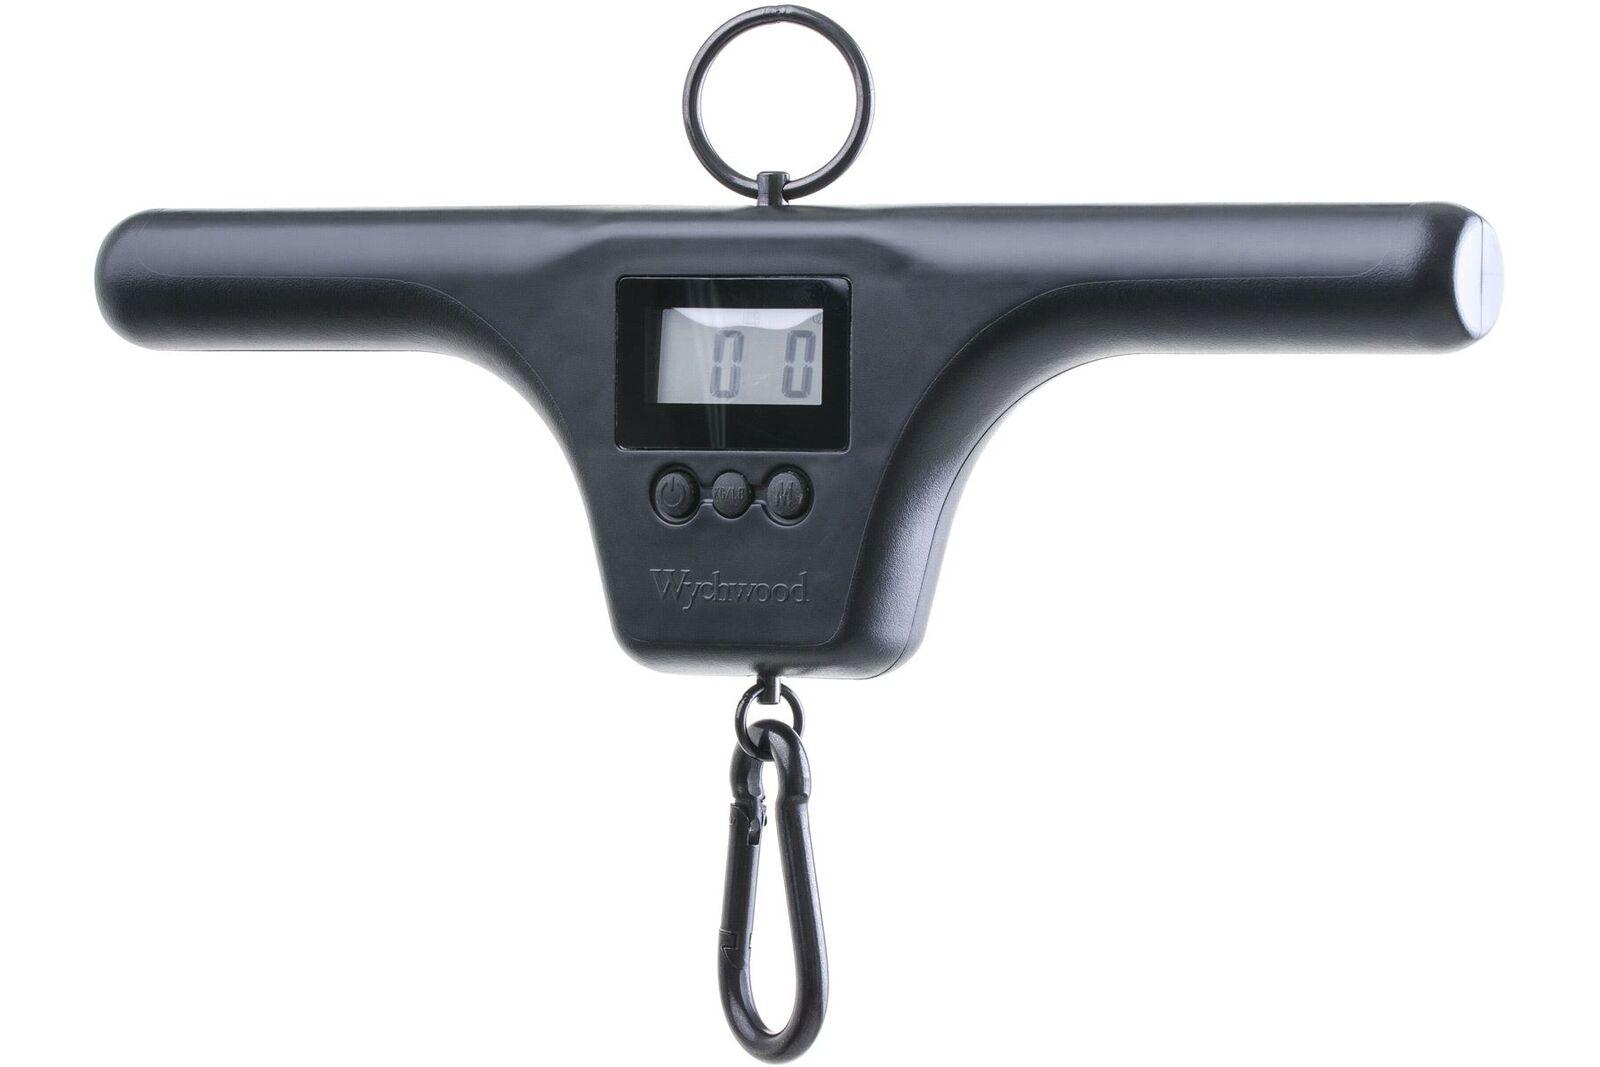 Wychwood T-Bar Scales  Dual Screen 120lb   Carp Fishing  best service